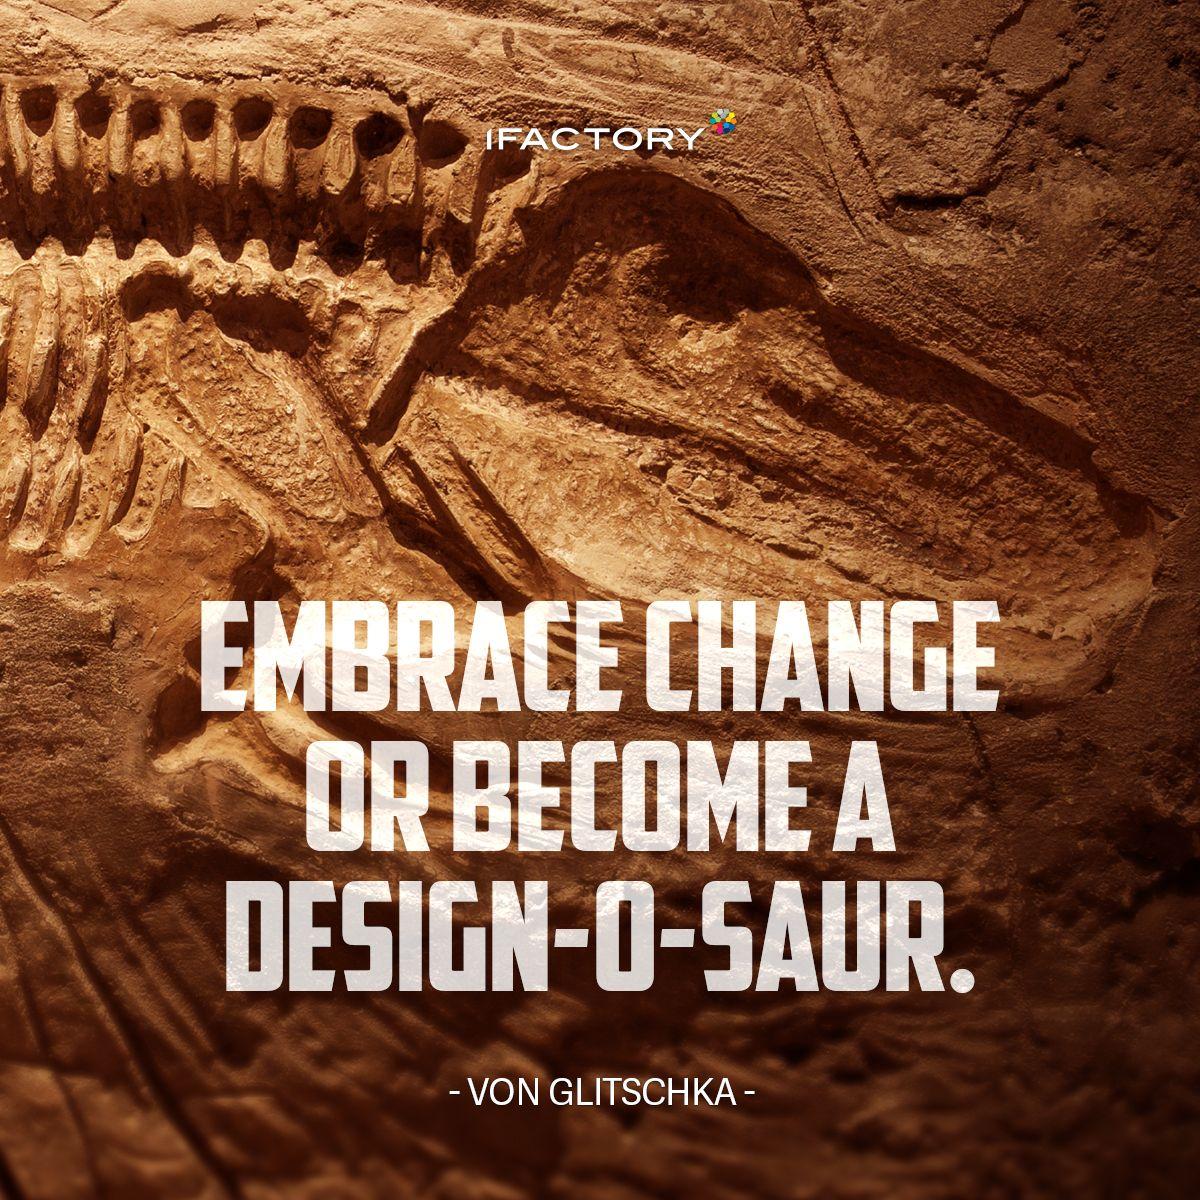 Embrace change or become a Design-O-Saur - Von Glitschka  #quotes #inspiration #inspo #ifactory #design #development #web